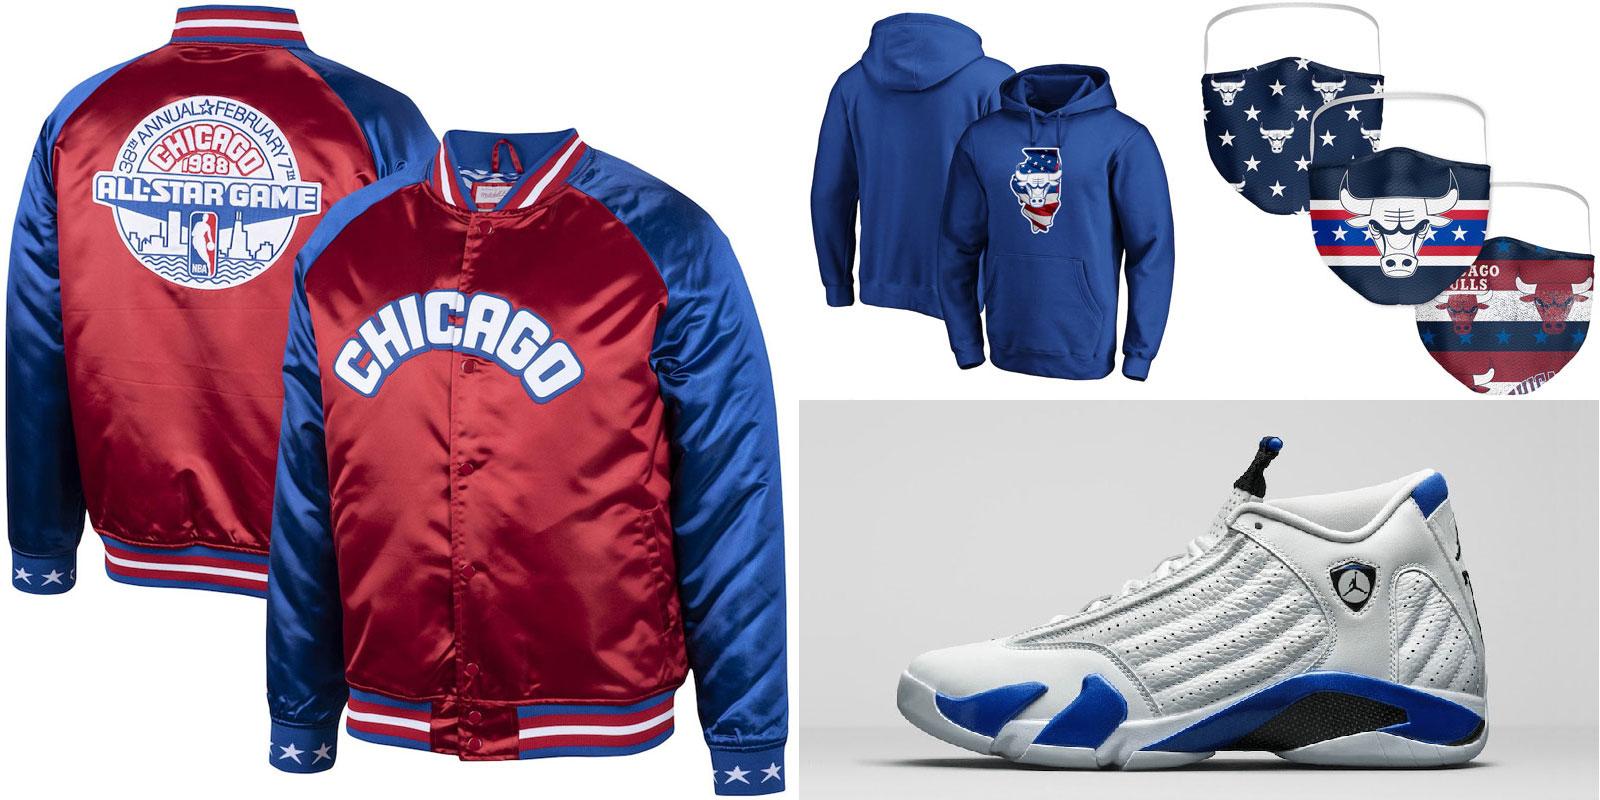 air-jordan-14-hyper-royal-chicago-bulls-clothing-match